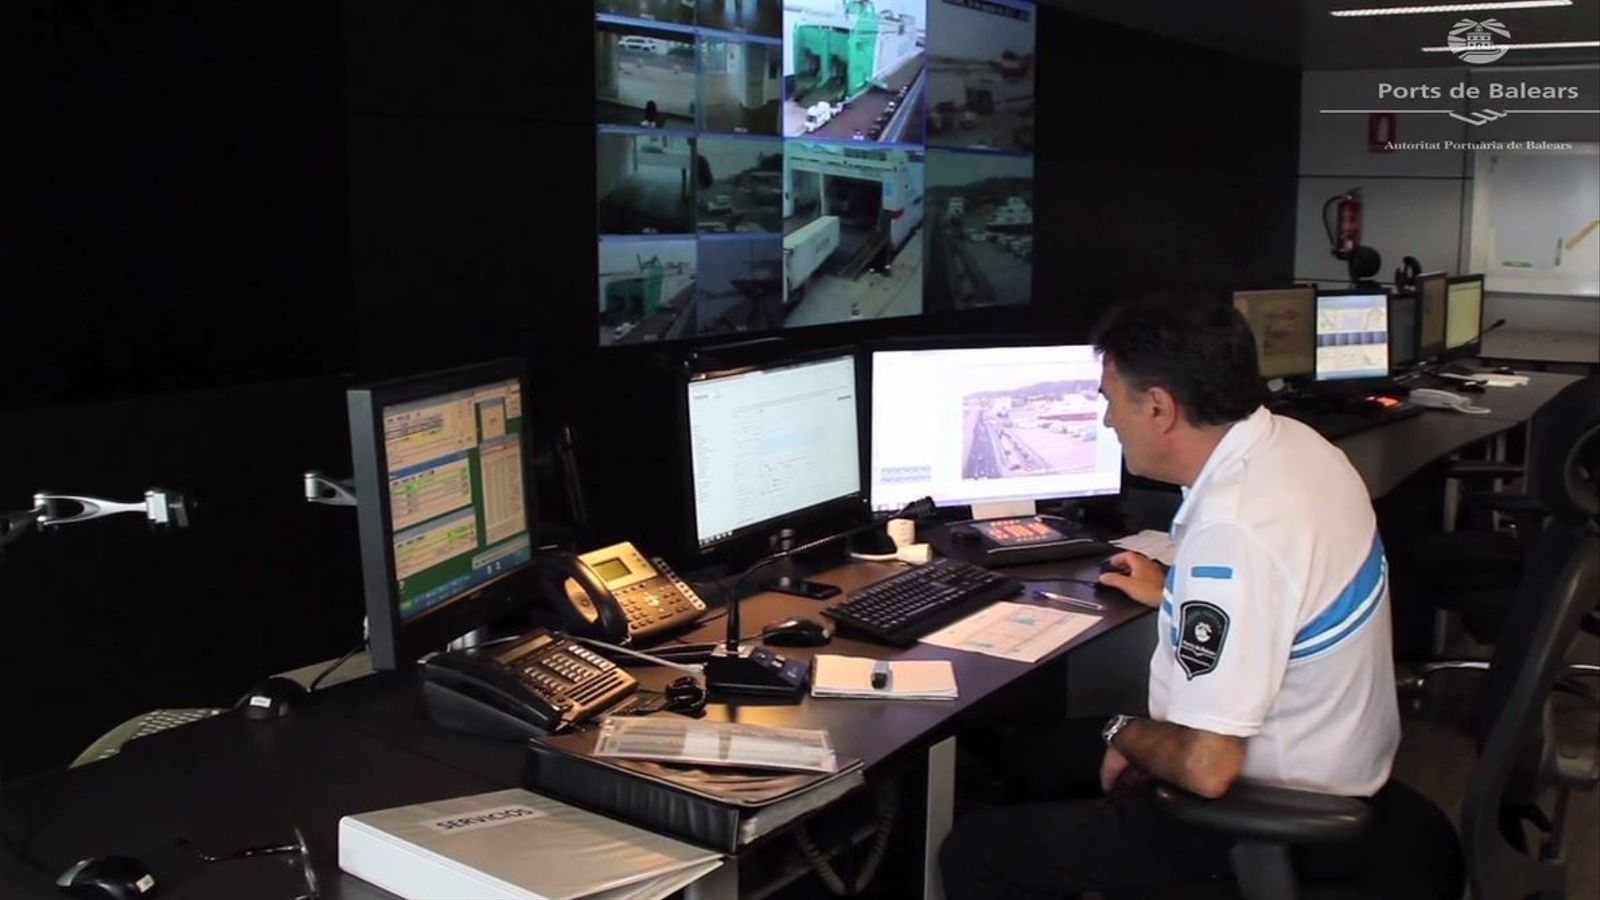 Policia portuària